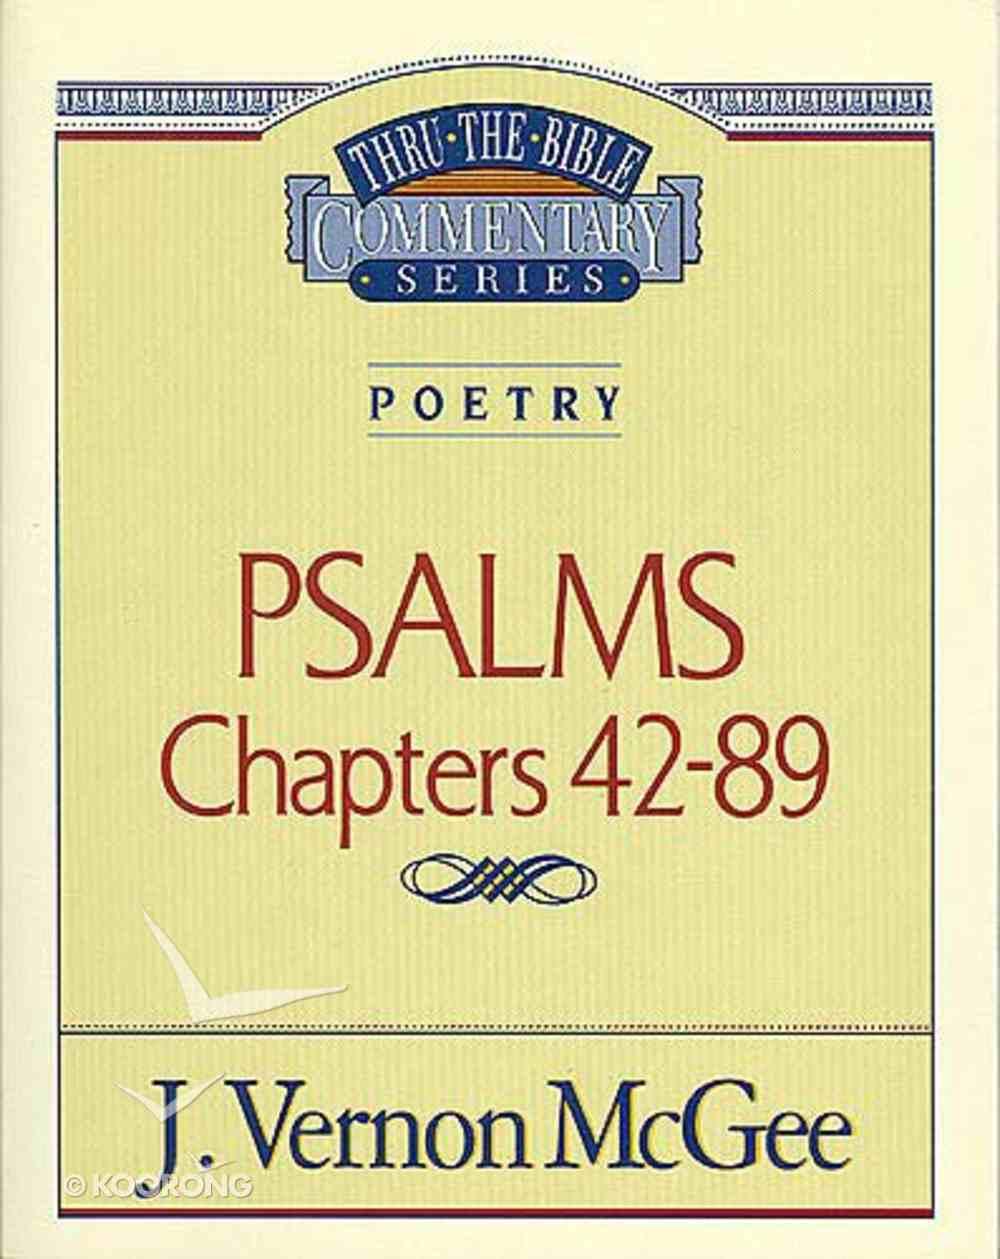 Thru the Bible OT #18: Psalms (Volume 2) (#18 in Thru The Bible Old Testament Series) Paperback